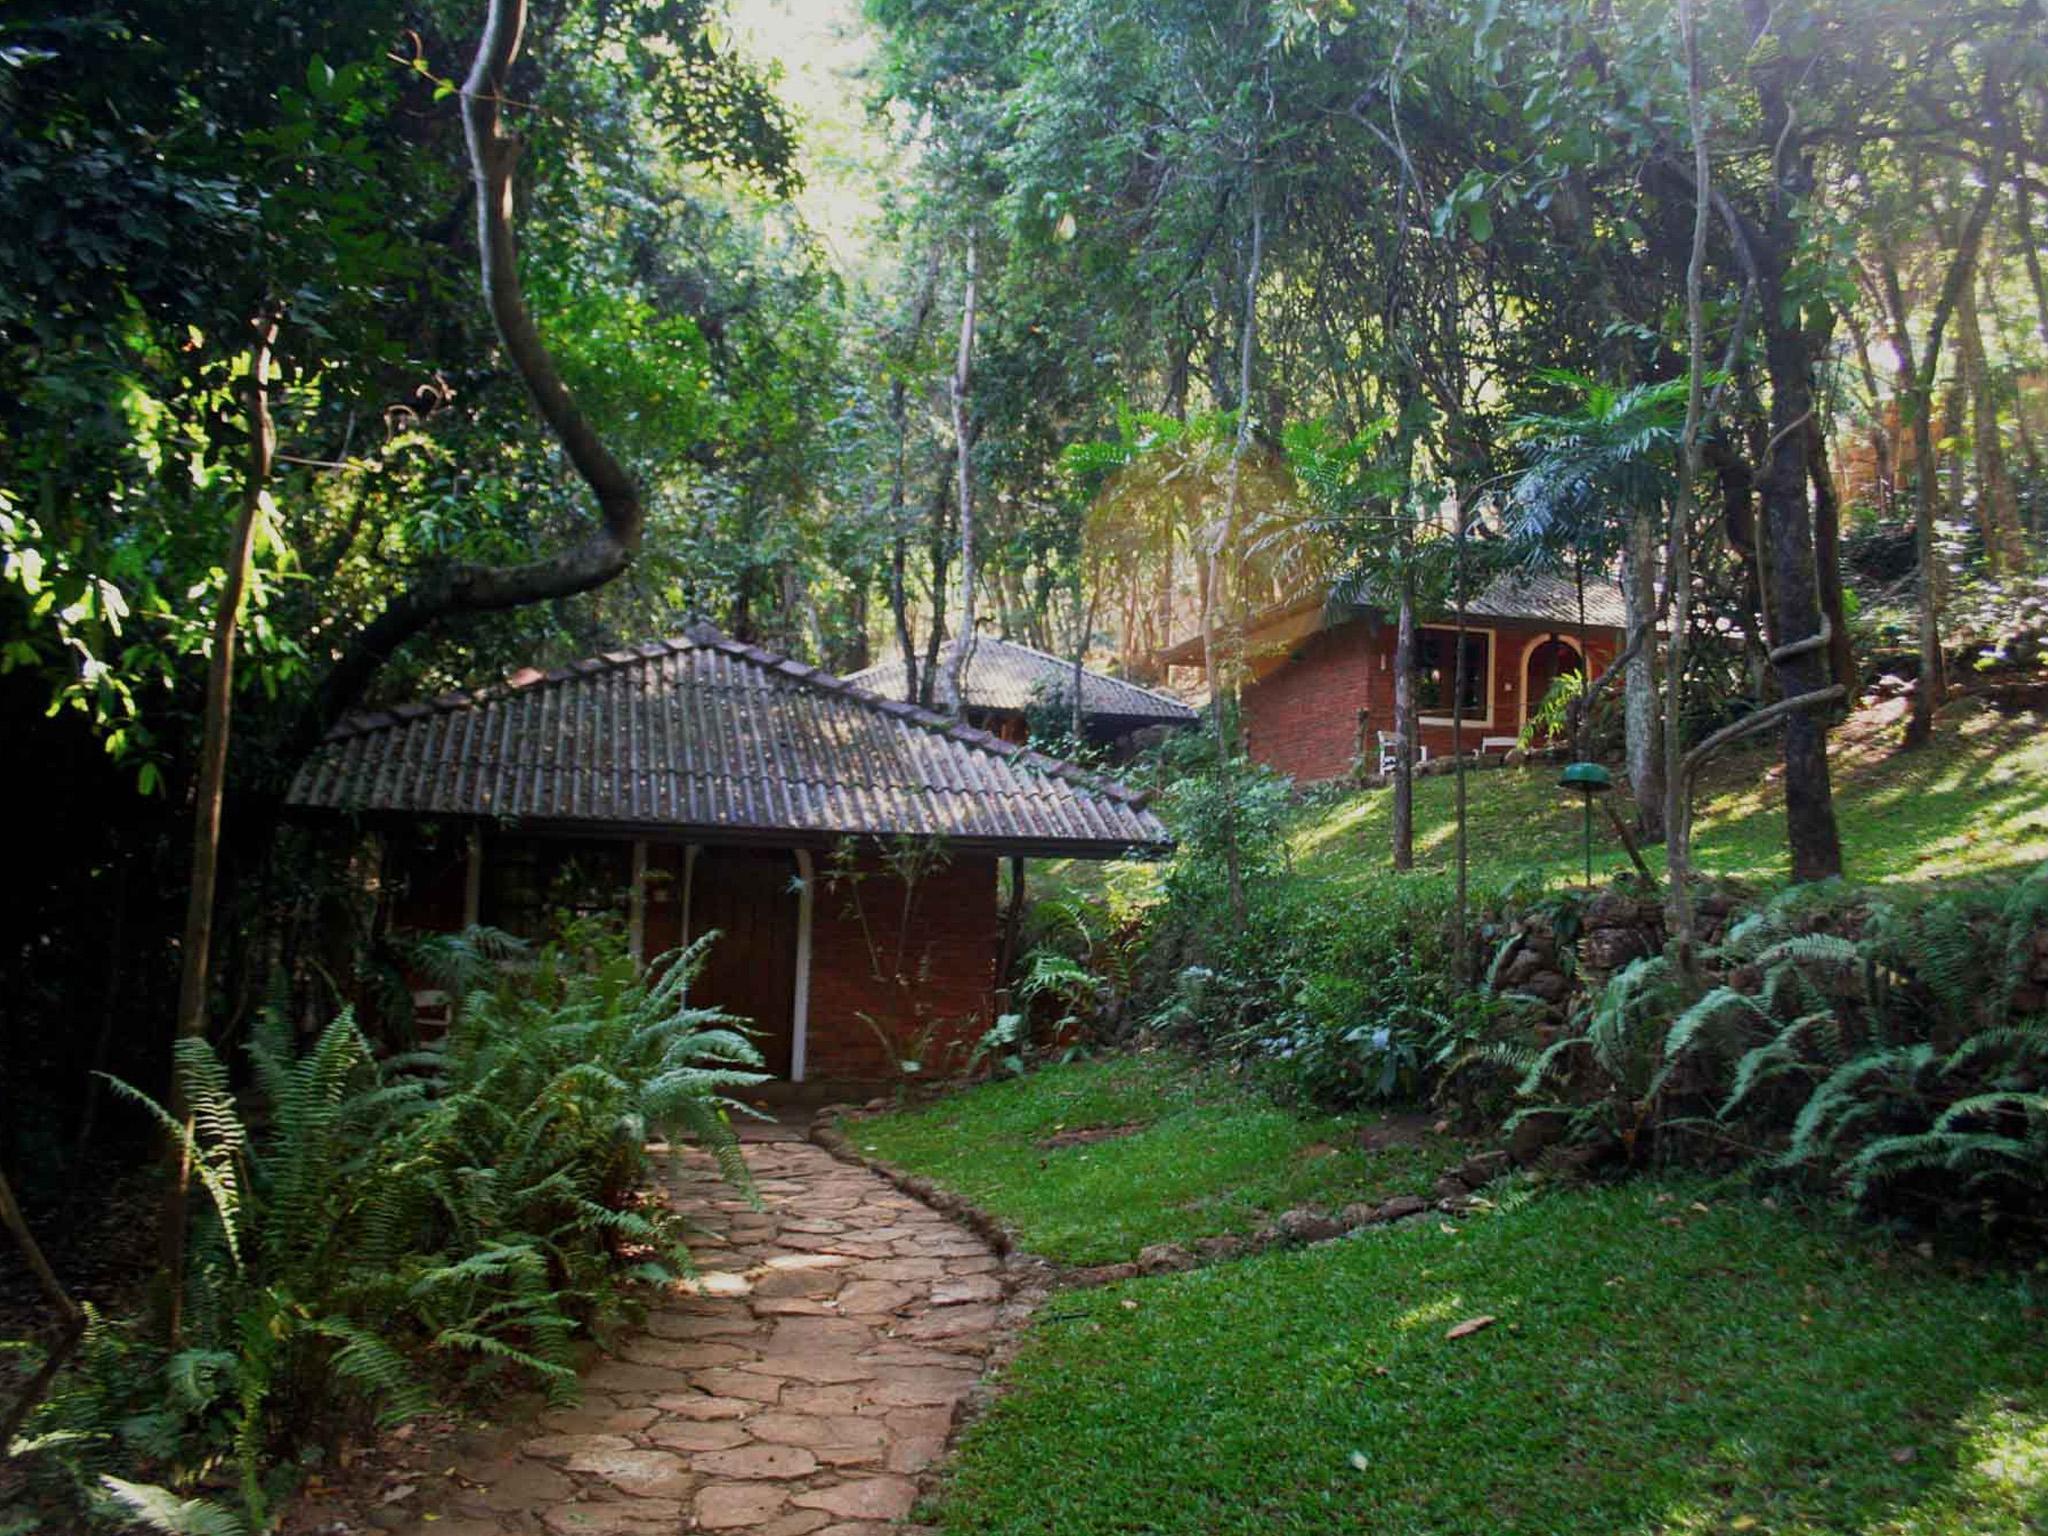 River Garden Resort - Rathnapura, Sri Lanka - Great discounted rates!